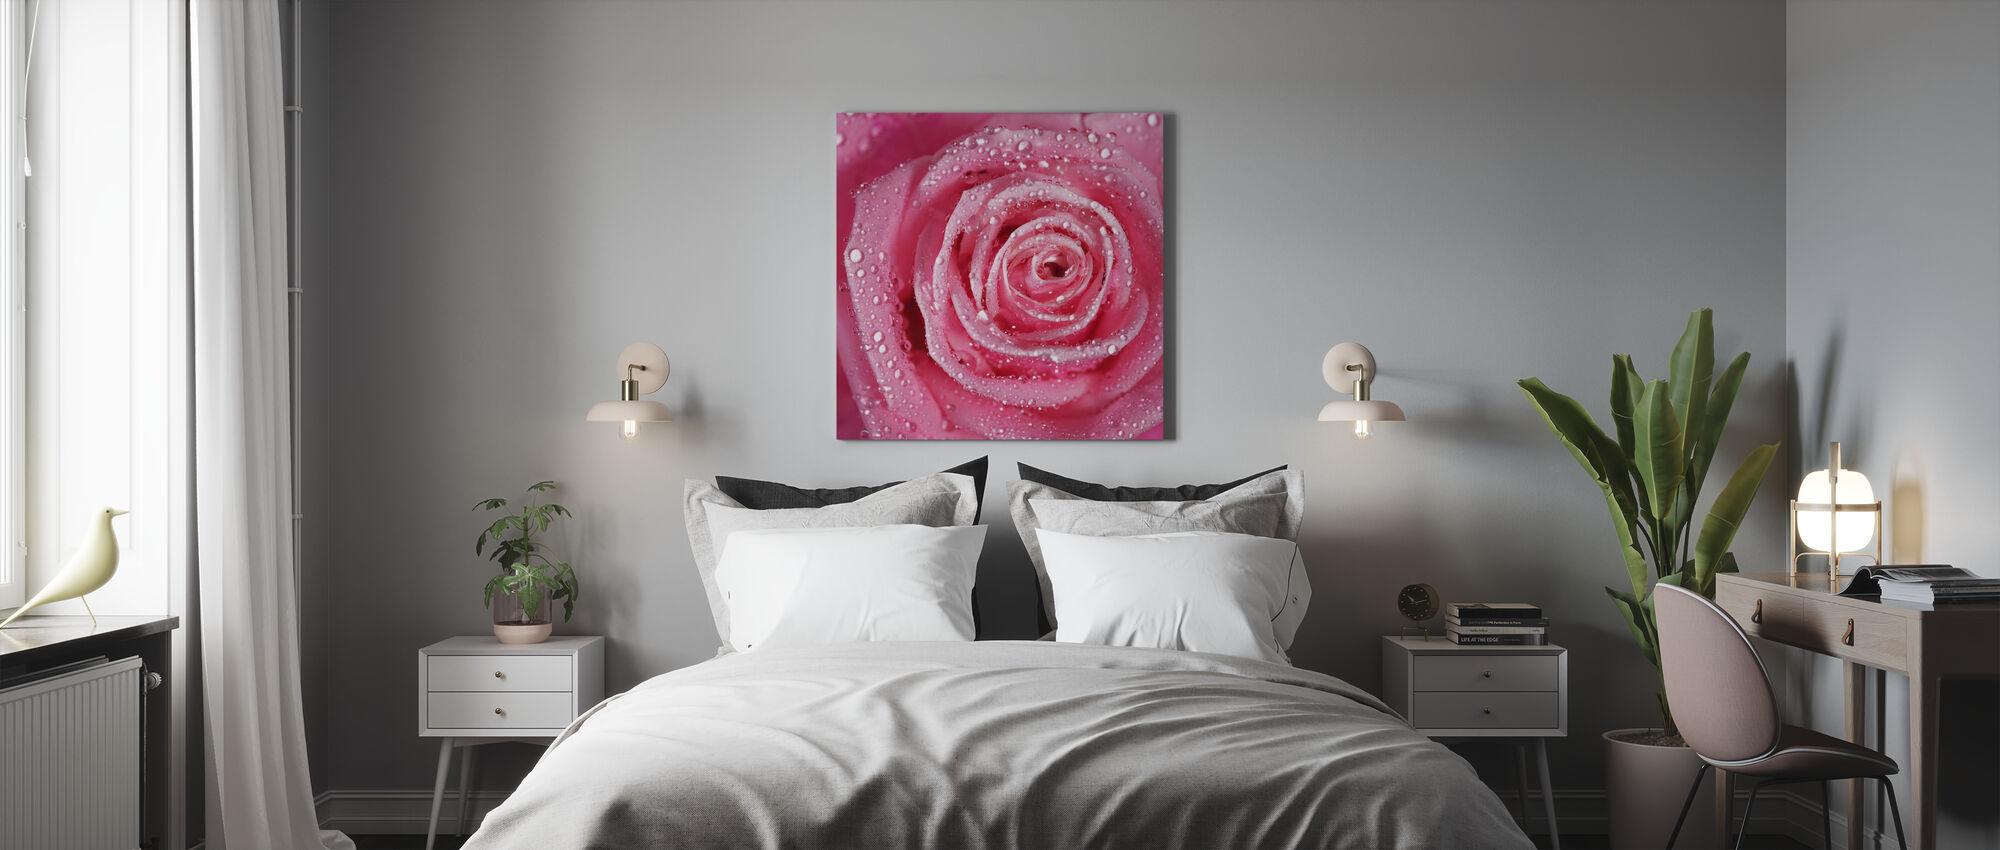 Rose Rose - Impression sur toile - Chambre